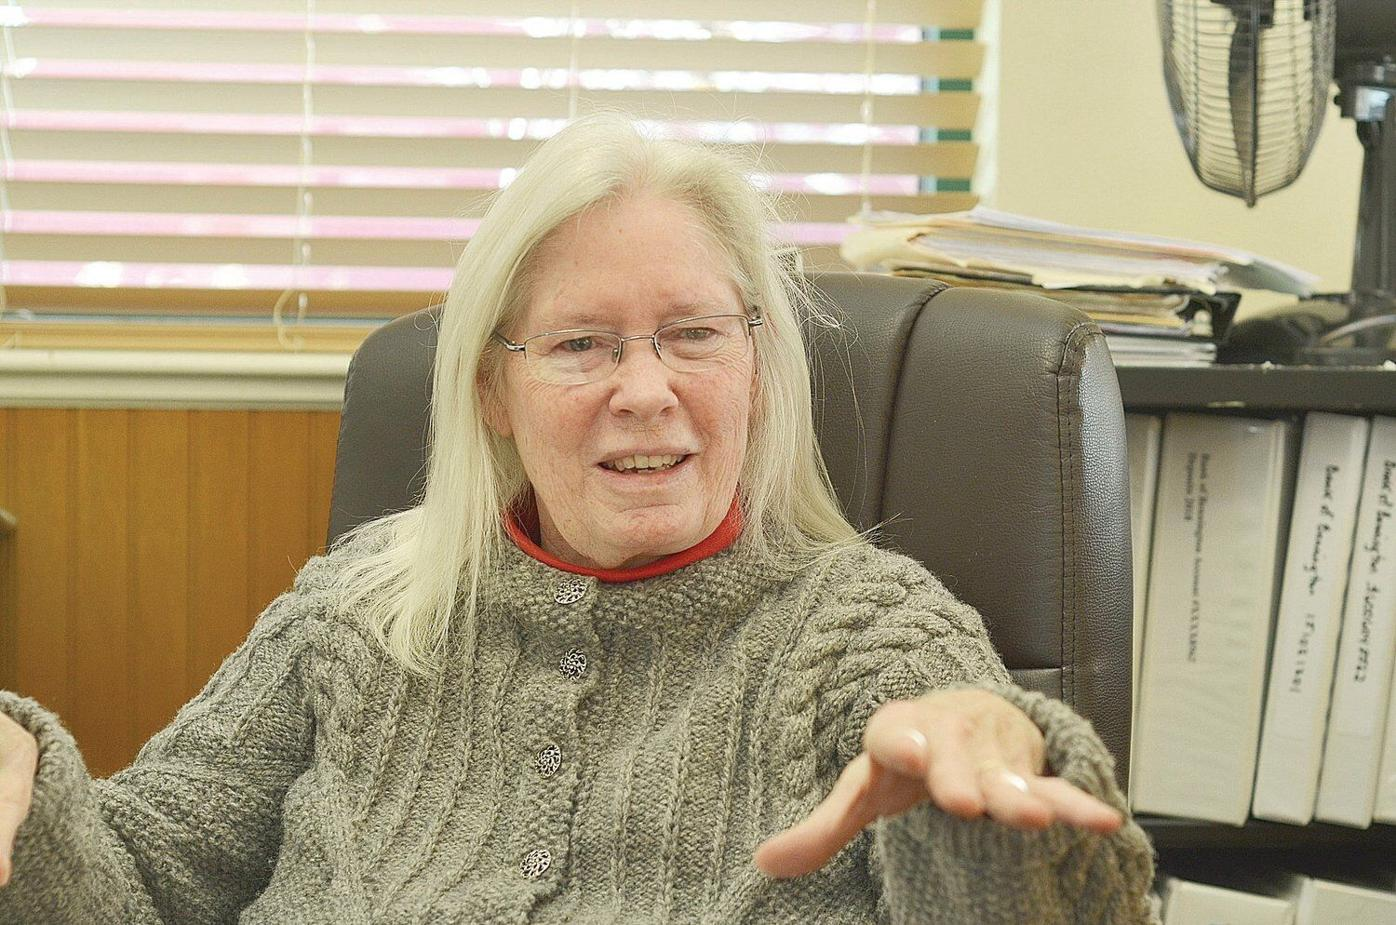 Sue Andrews sets sights on post-GBICS goals